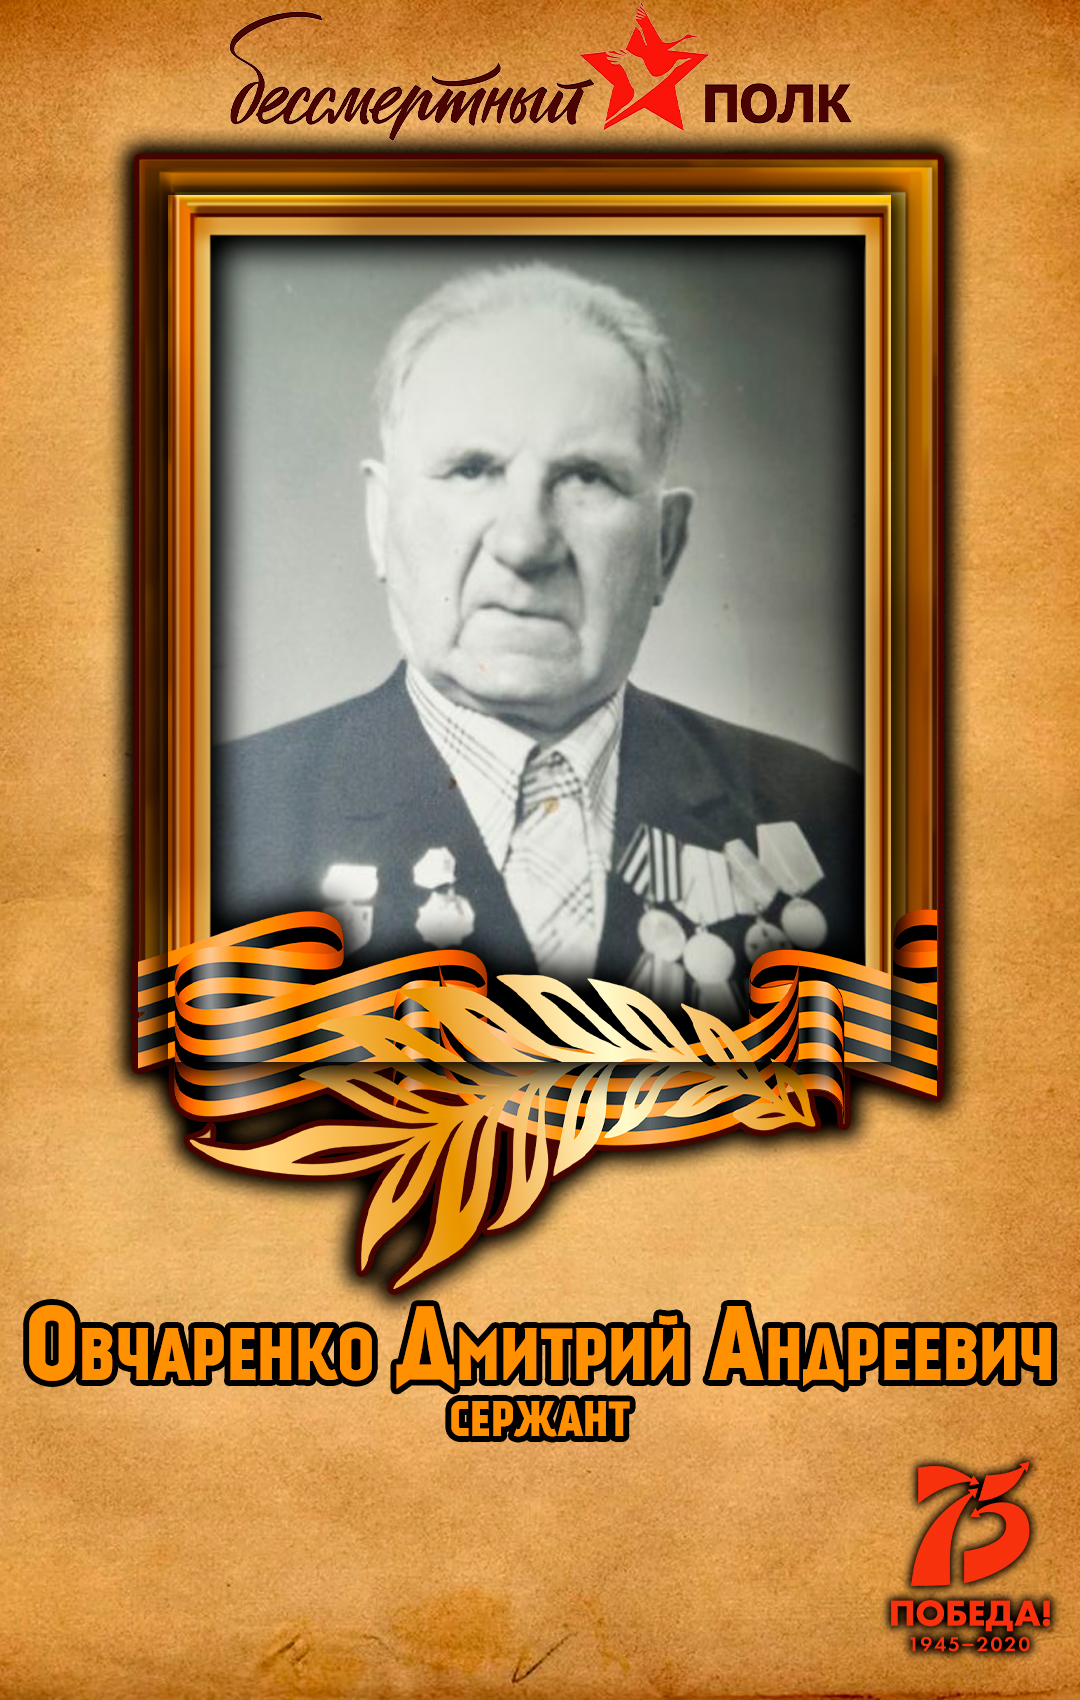 Овчаренко-Дмитрий-Андреевич